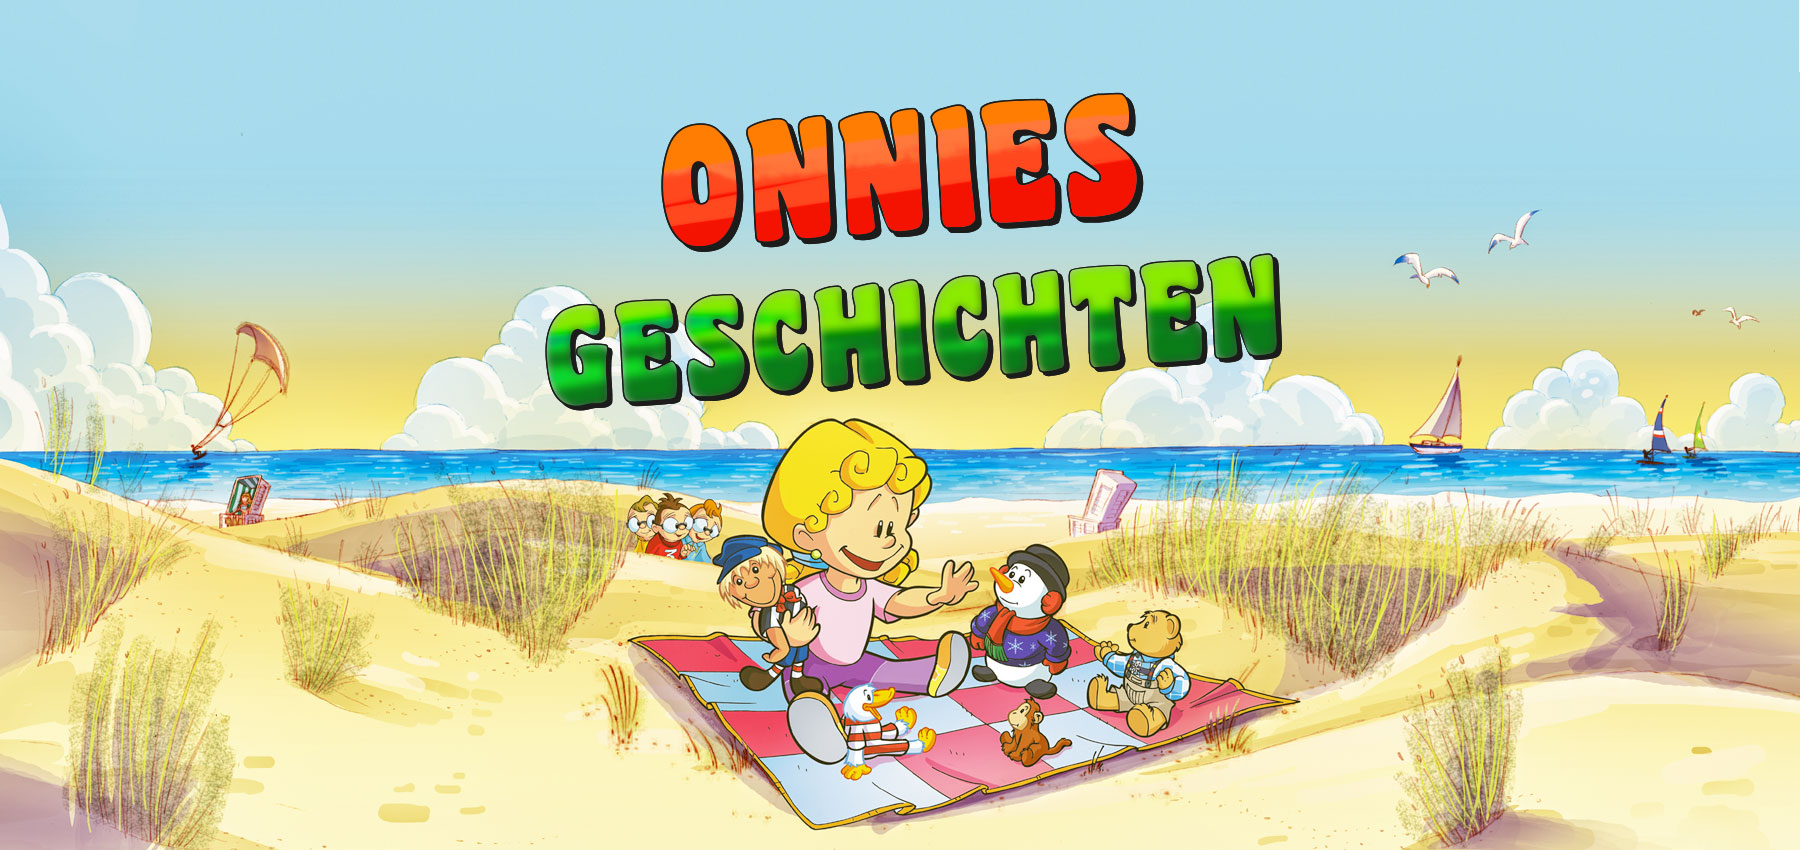 Onnies Geschichten-1.1